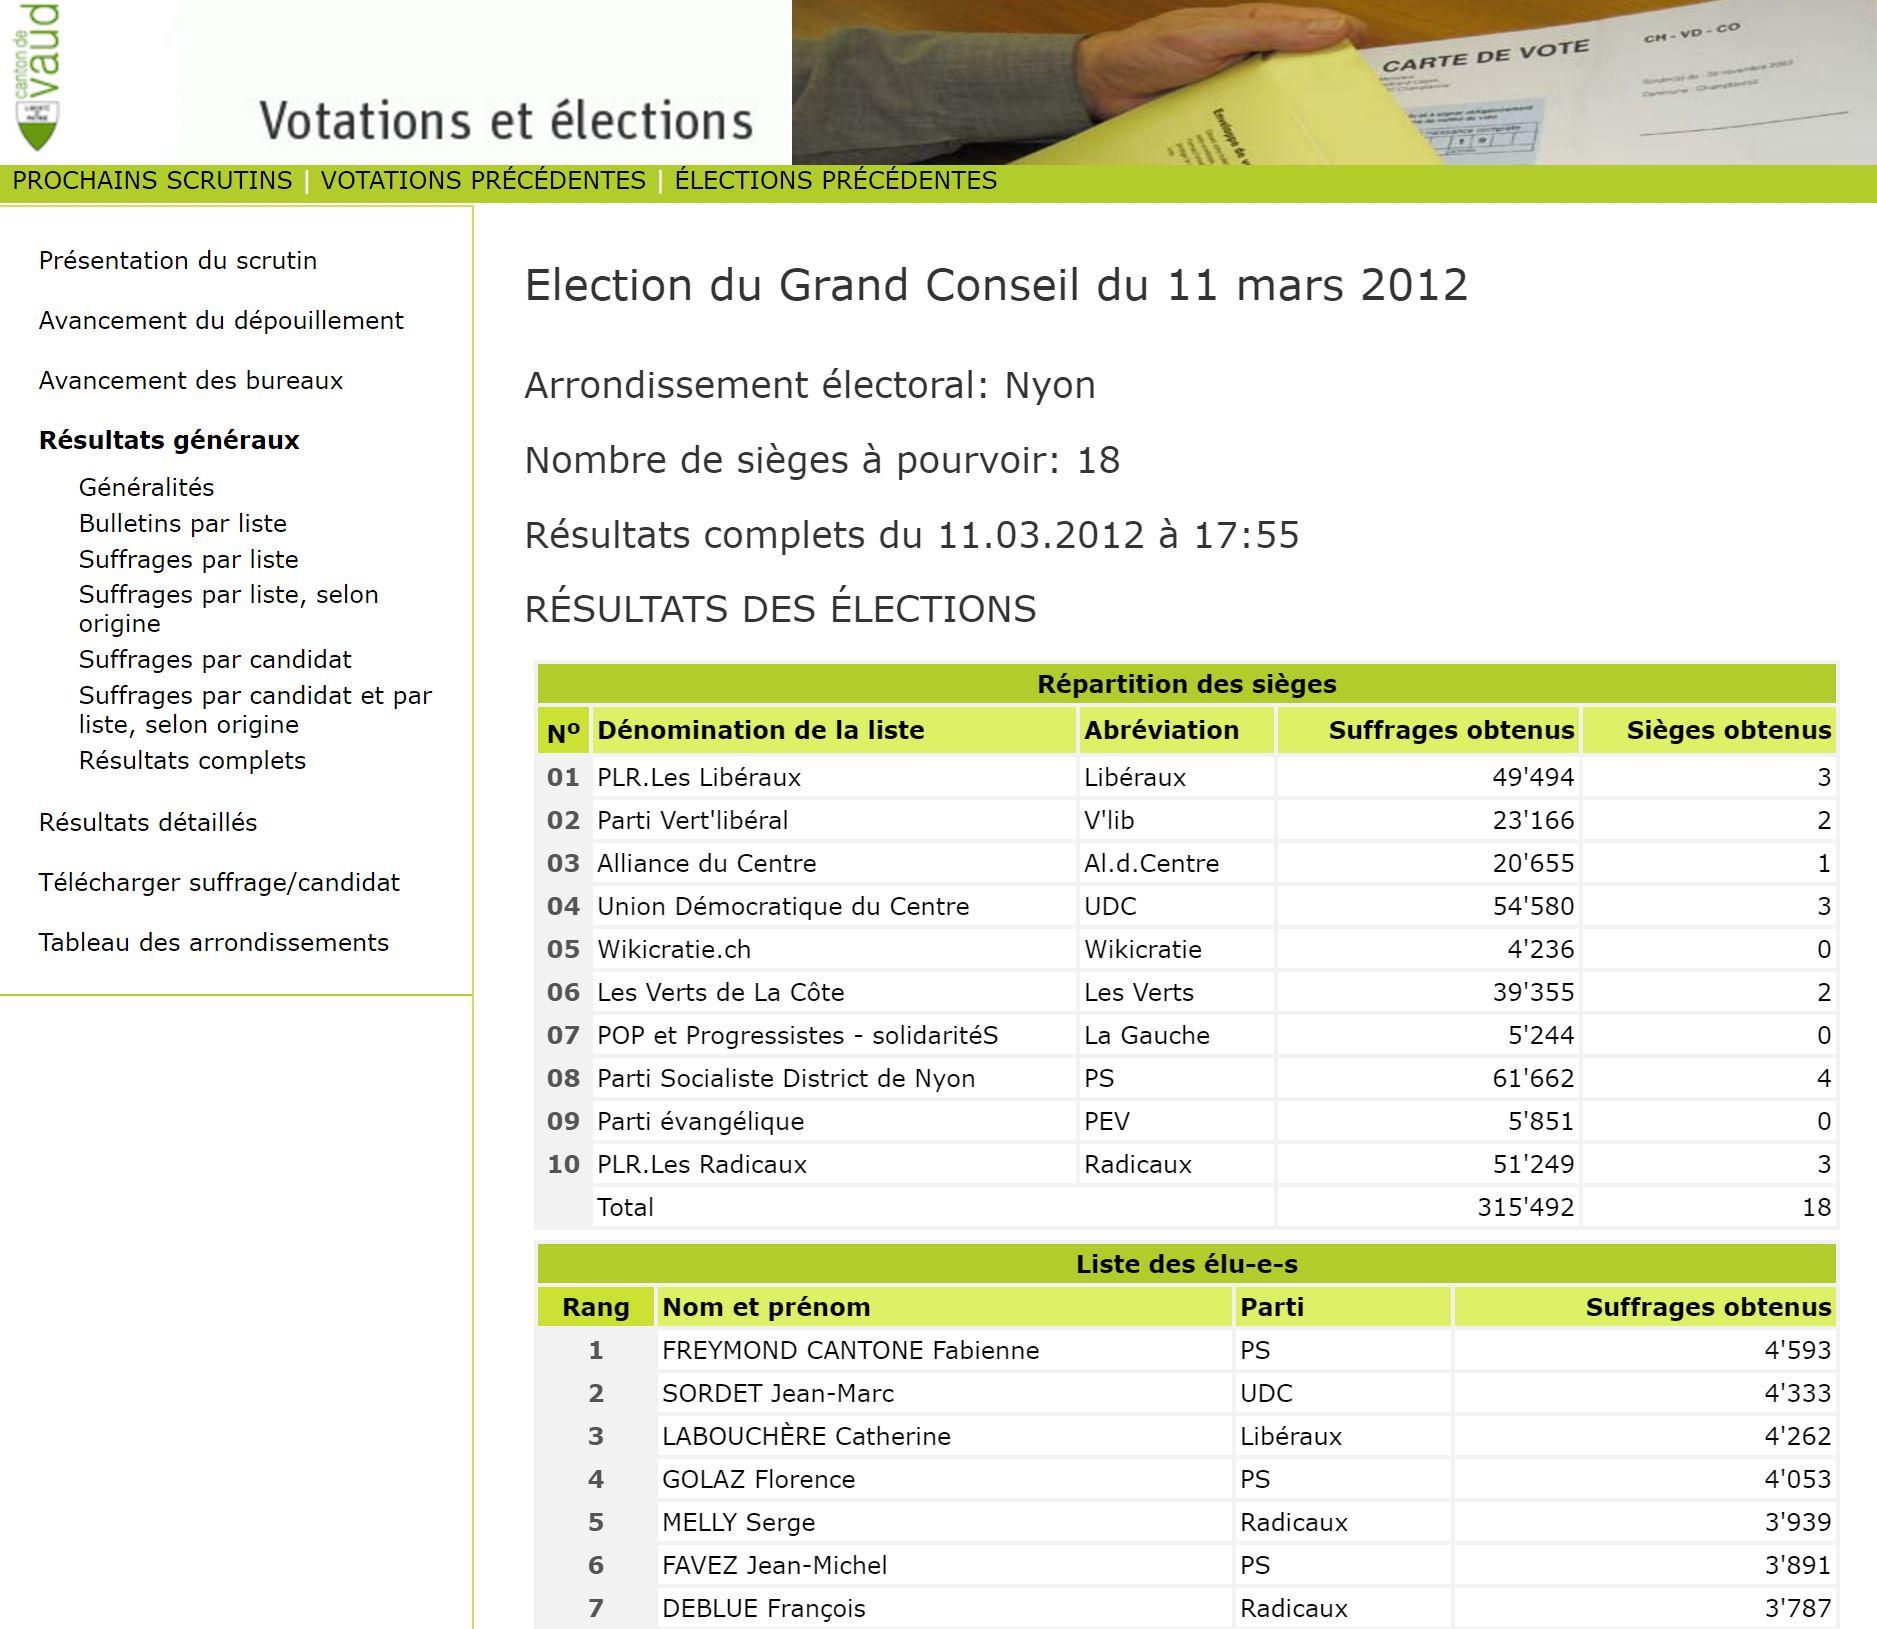 Copy of 2012-03-11 Résultats du Grand Conseil